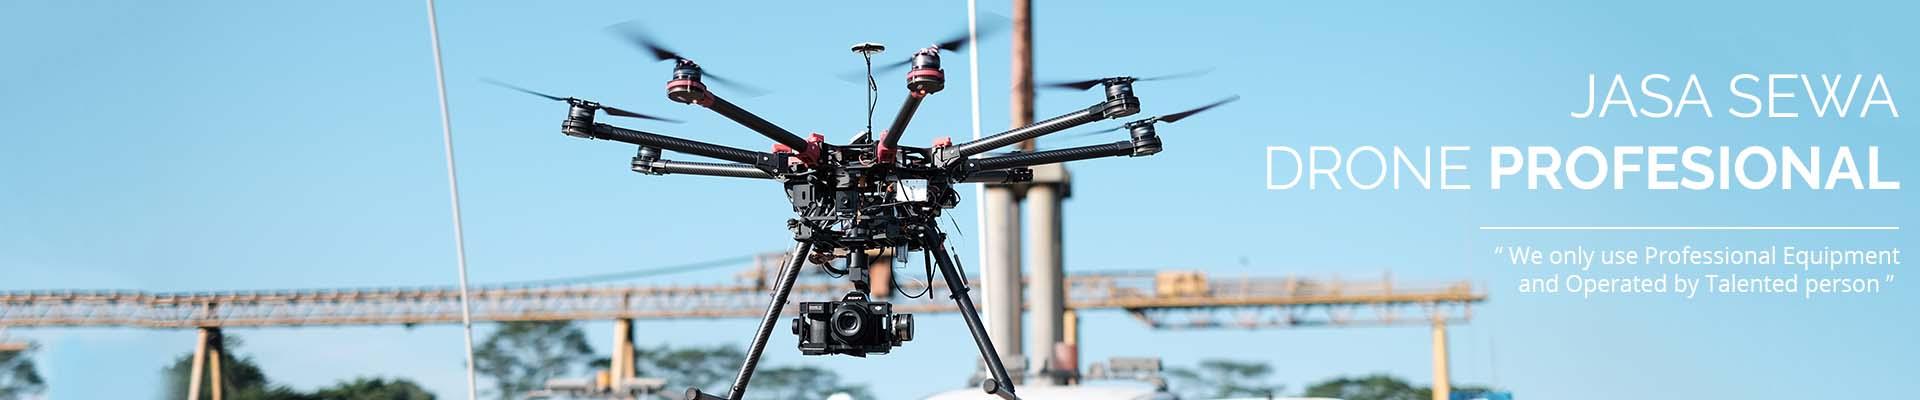 jasa-sewa-drone-kamera-udara